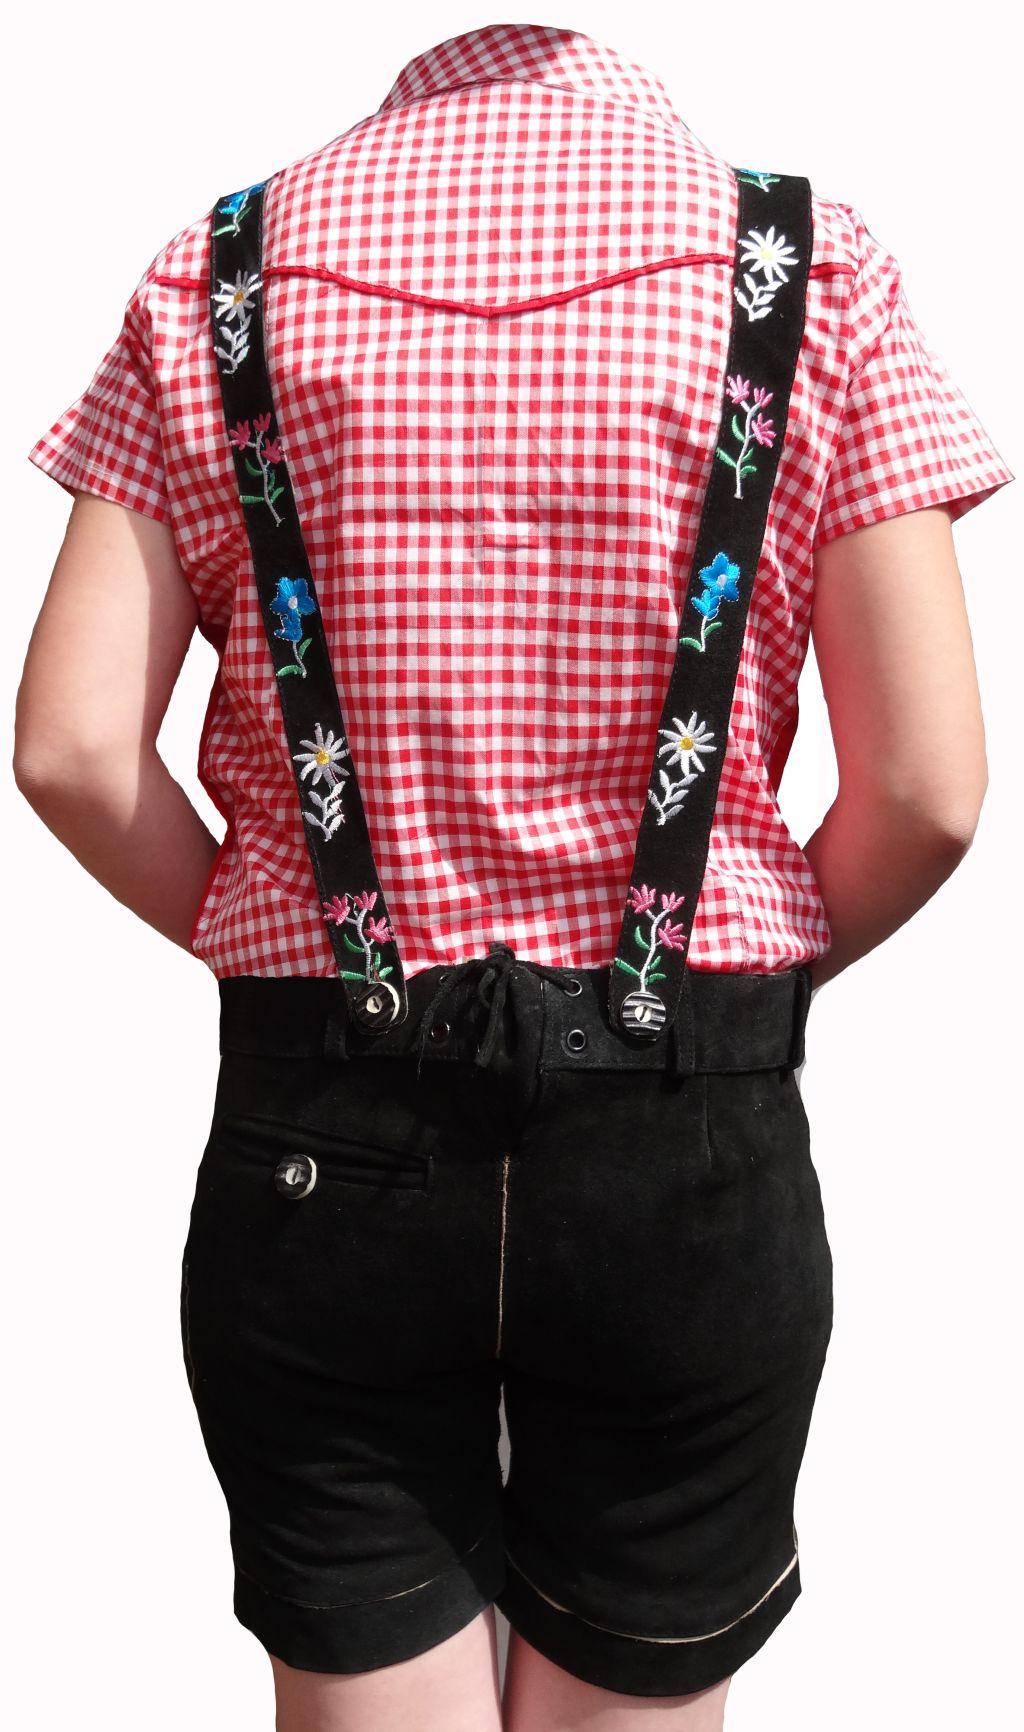 Trachten Lederhose Damen kurz schwarz Hosenträger 36 38 40 42 44